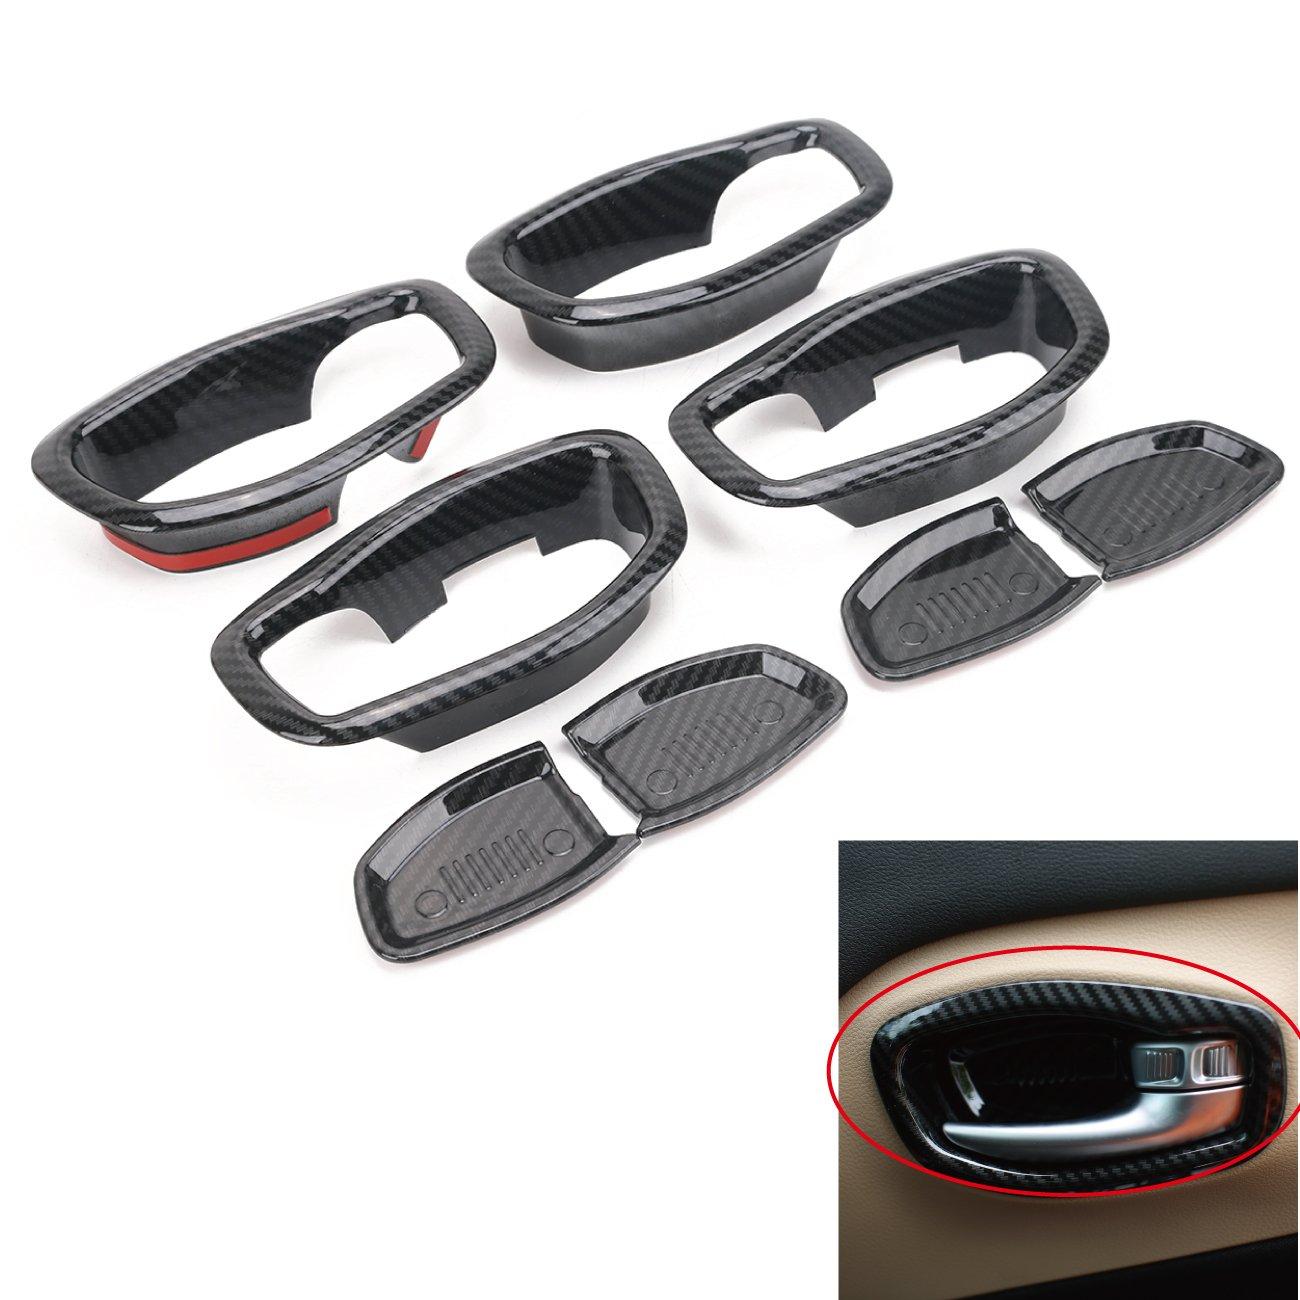 For RENEGADE 2015 - 2017, Boxatdoor interno auto telaio interno decorativo Trim Carbon nero